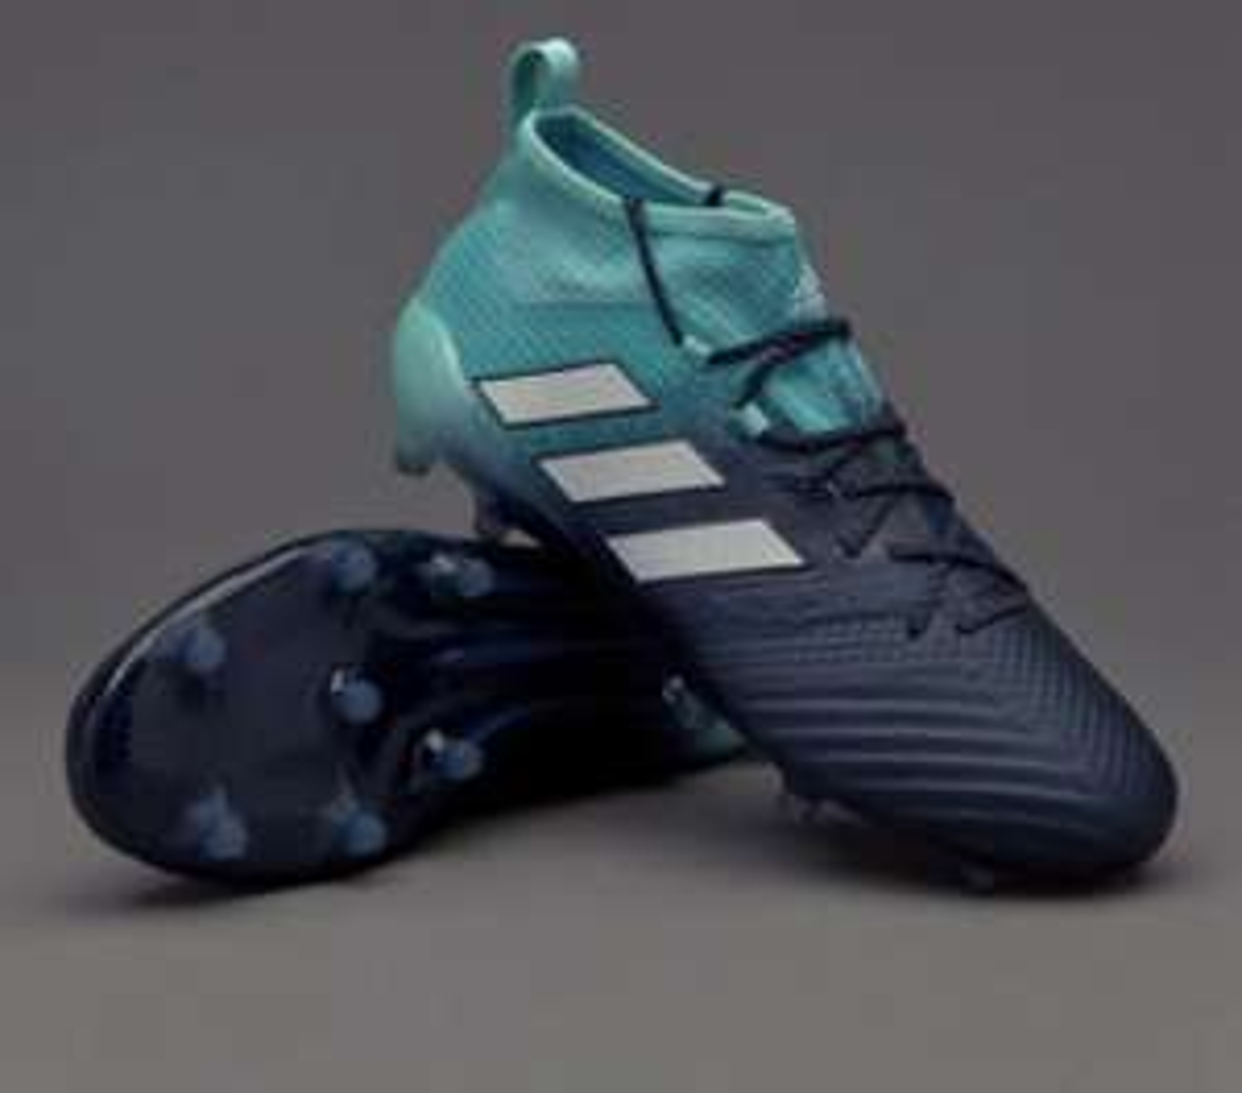 adidas ACE 17.1 FG Primeknit Fußballschuhe blau